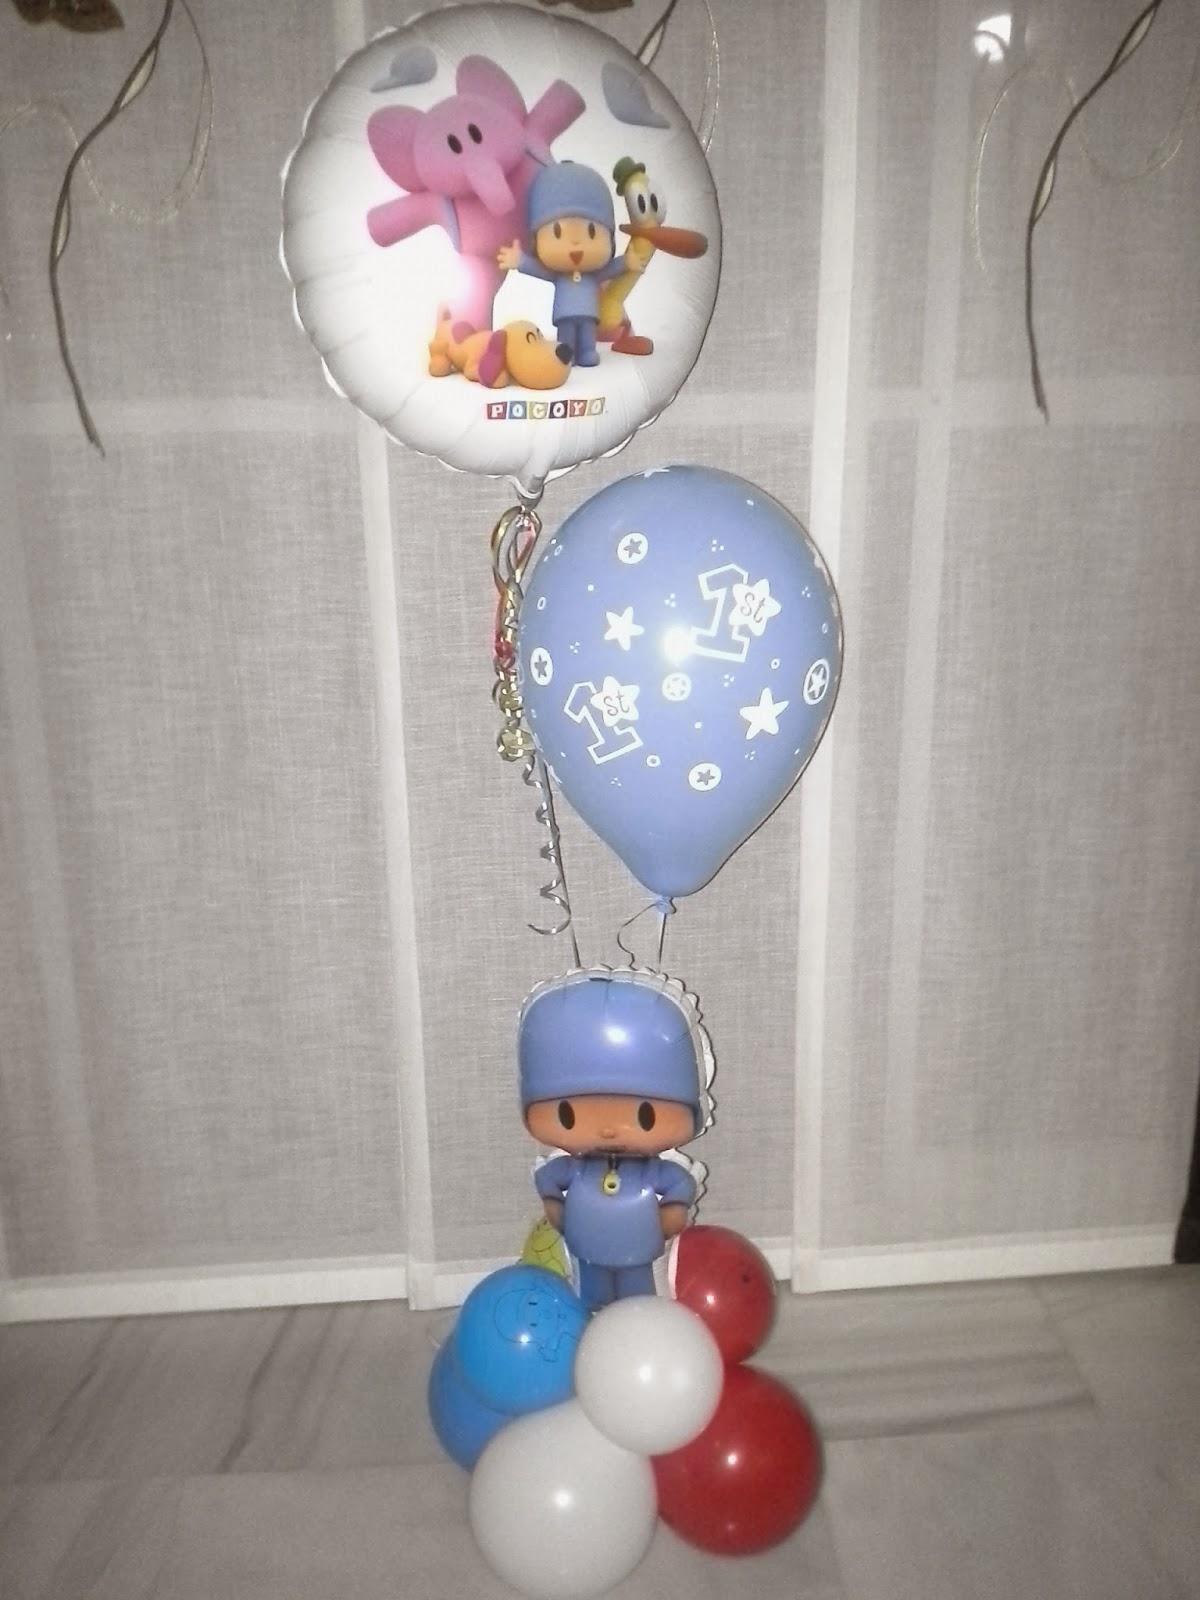 Decoraciones D'glObOs!: 1º Cumpleaños de Pocoyo D'glObOs!